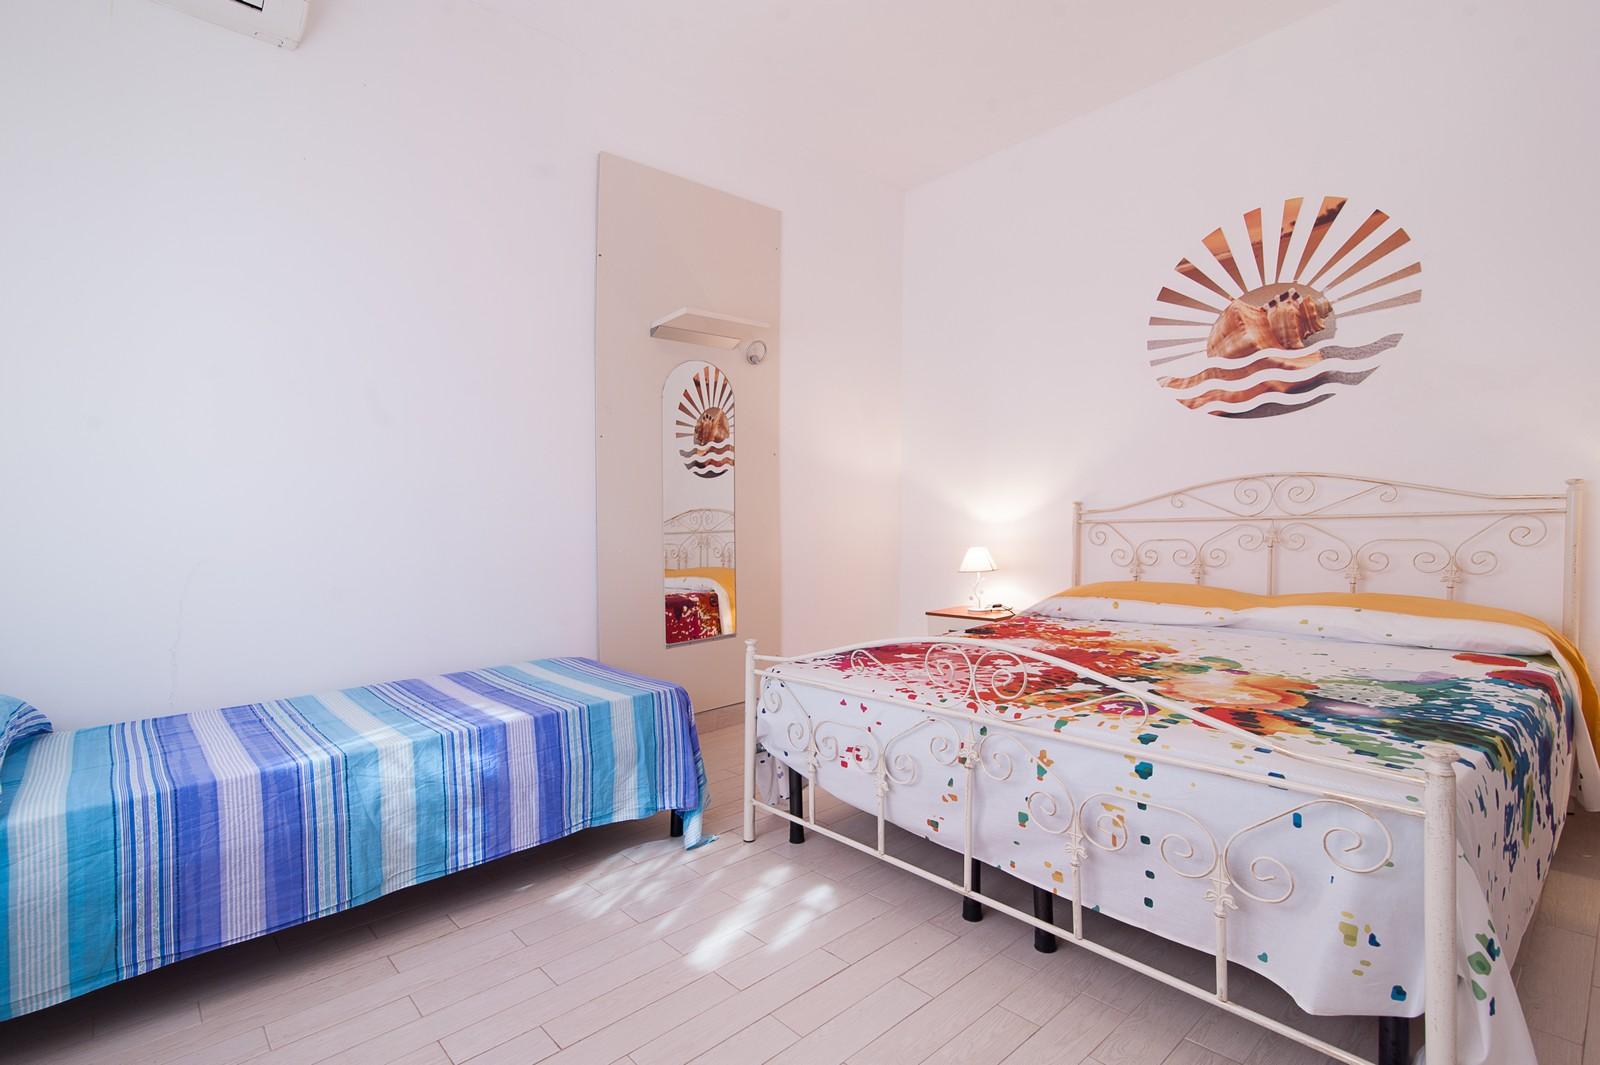 Ferienhaus Villa Mariposa  n. 2-150 meters from the beach (2354066), Porto Cesareo, Lecce, Apulien, Italien, Bild 11